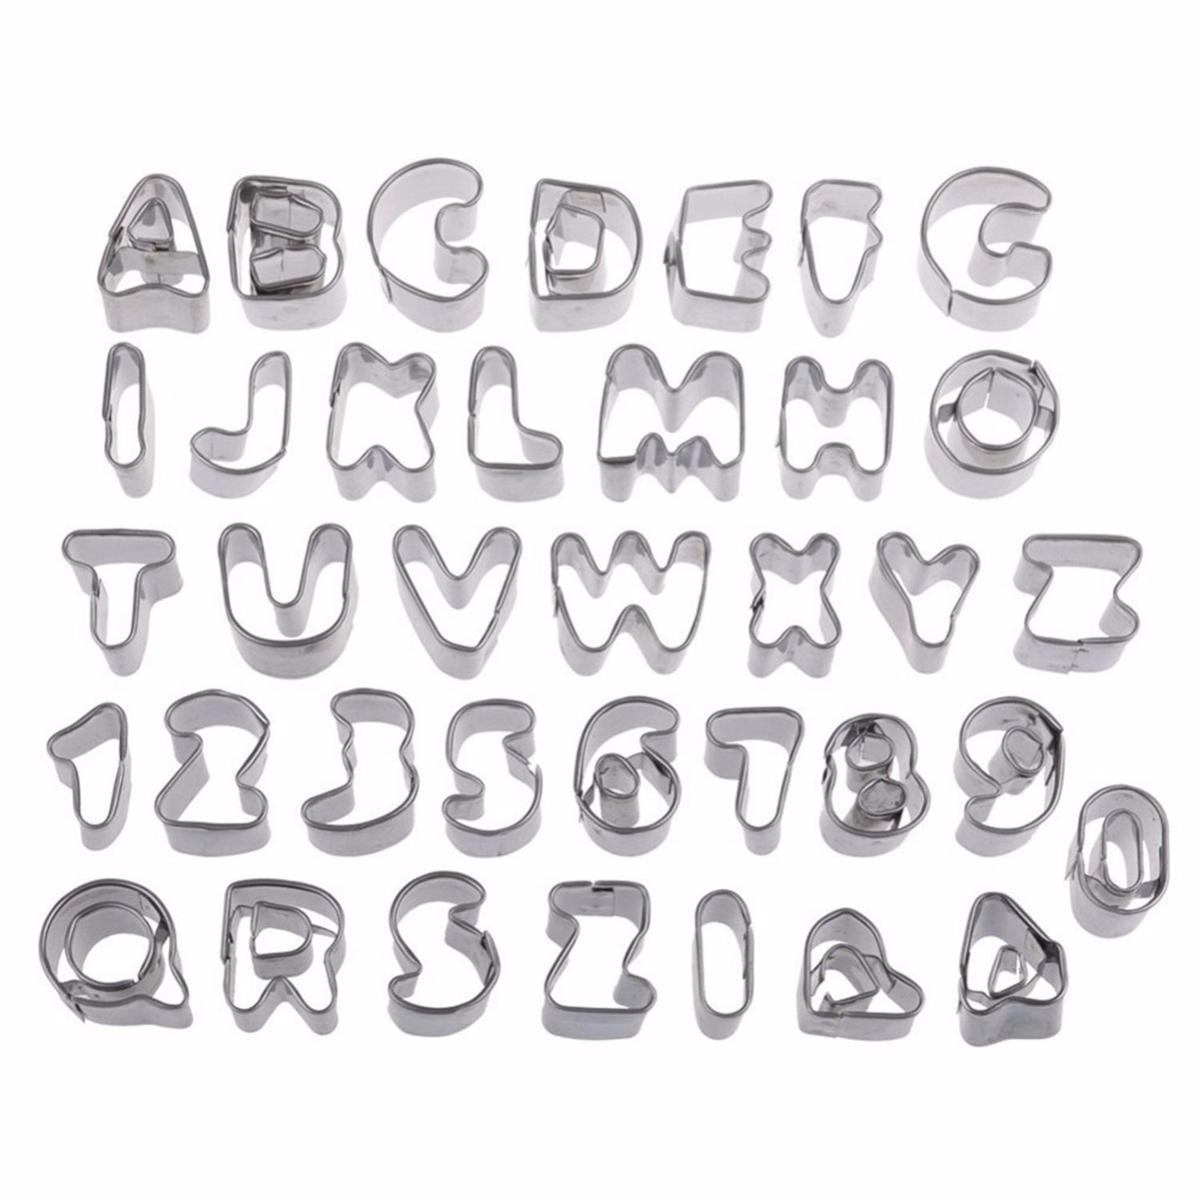 37 Piece Biscuit Cake Kitchen Stainless Steel Silver Set